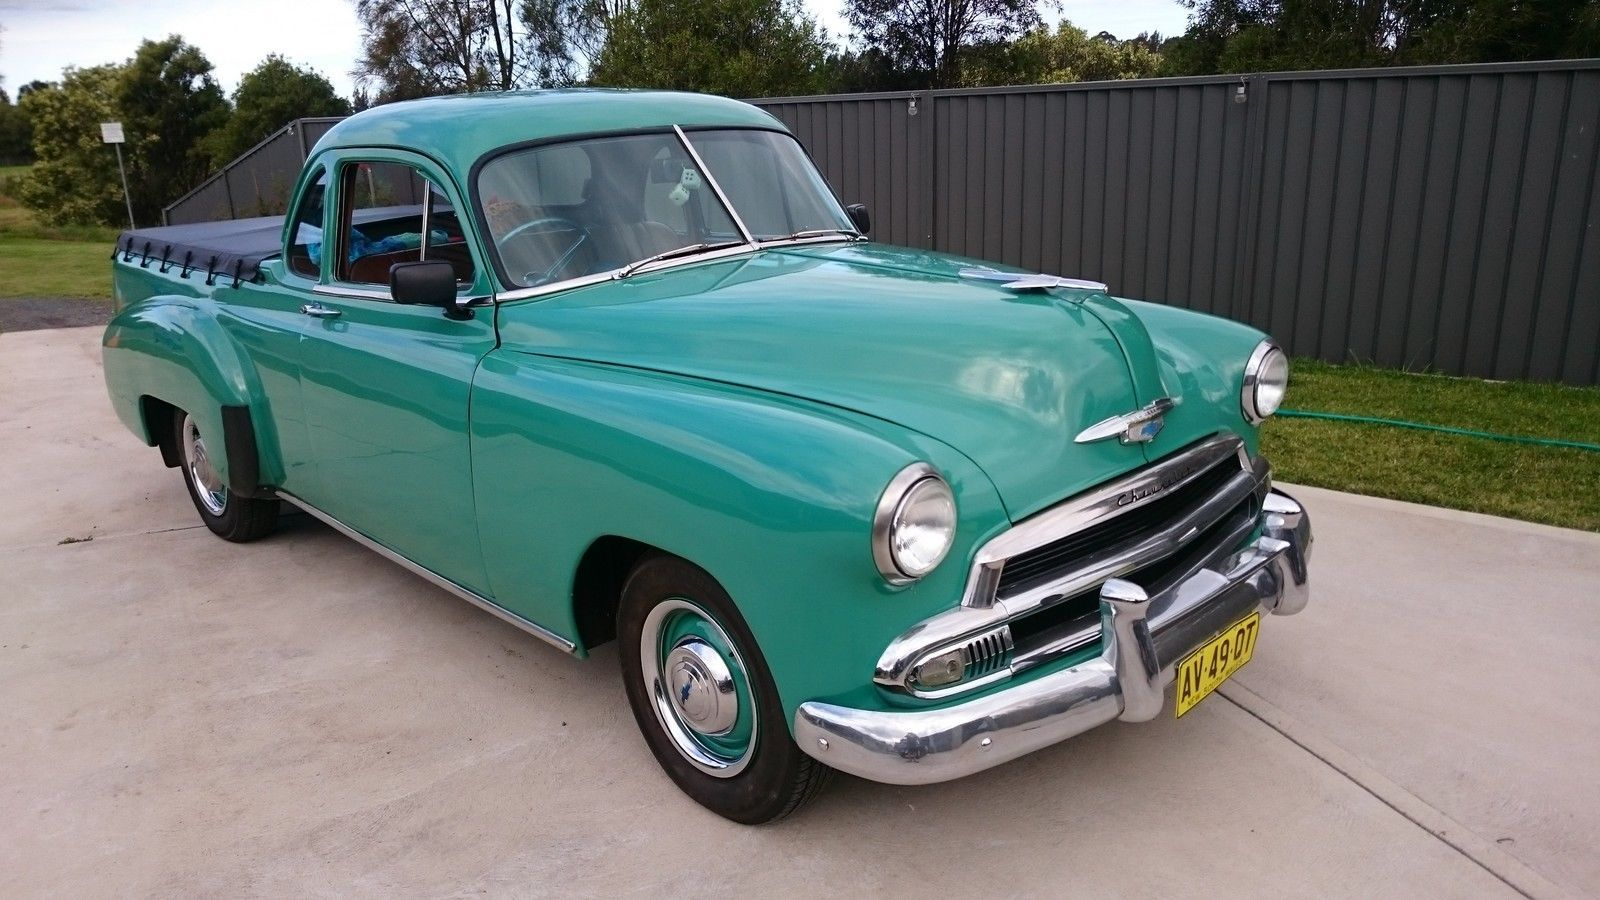 1951 Chev UTE R H Drive in NSW Australian cars, Ute